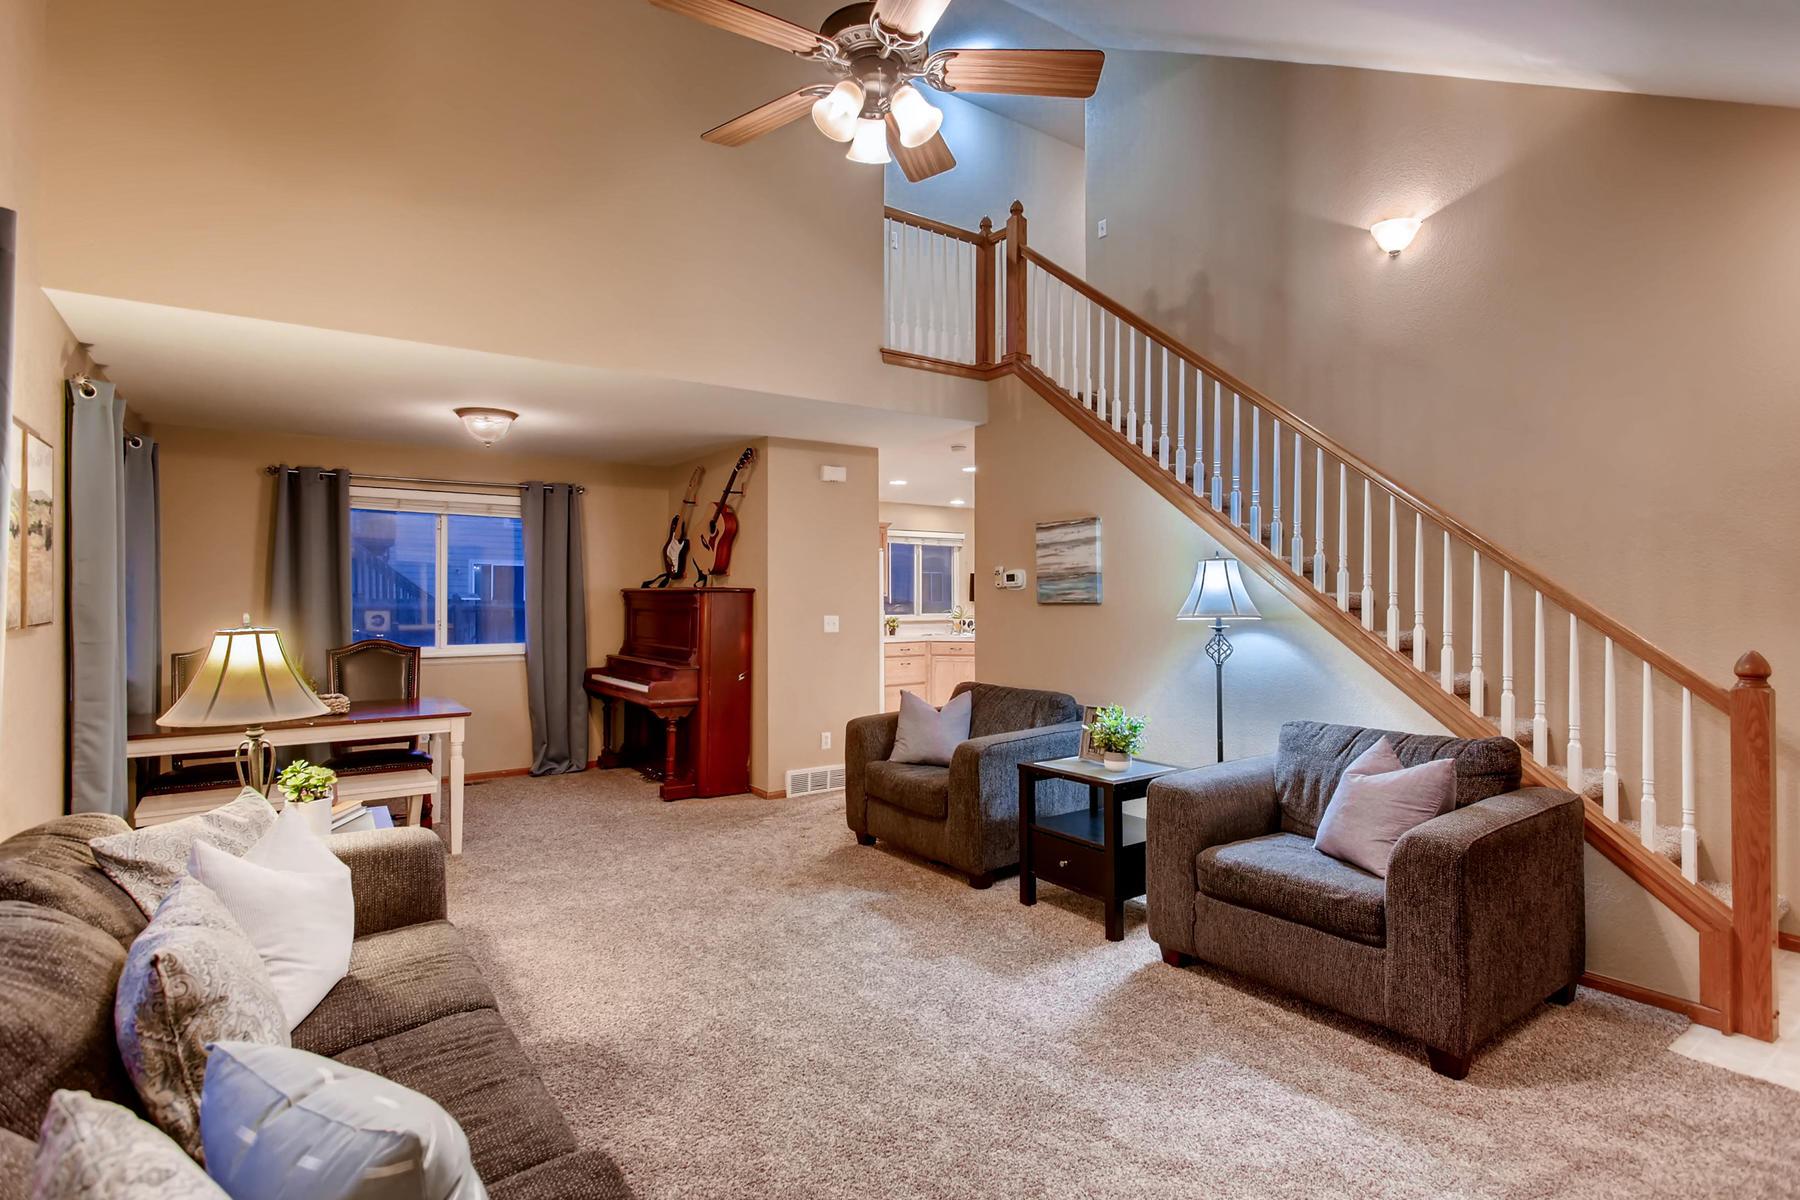 863 Eagle Dr Loveland CO 80537-006-002-Living Room-MLS_Size.jpg